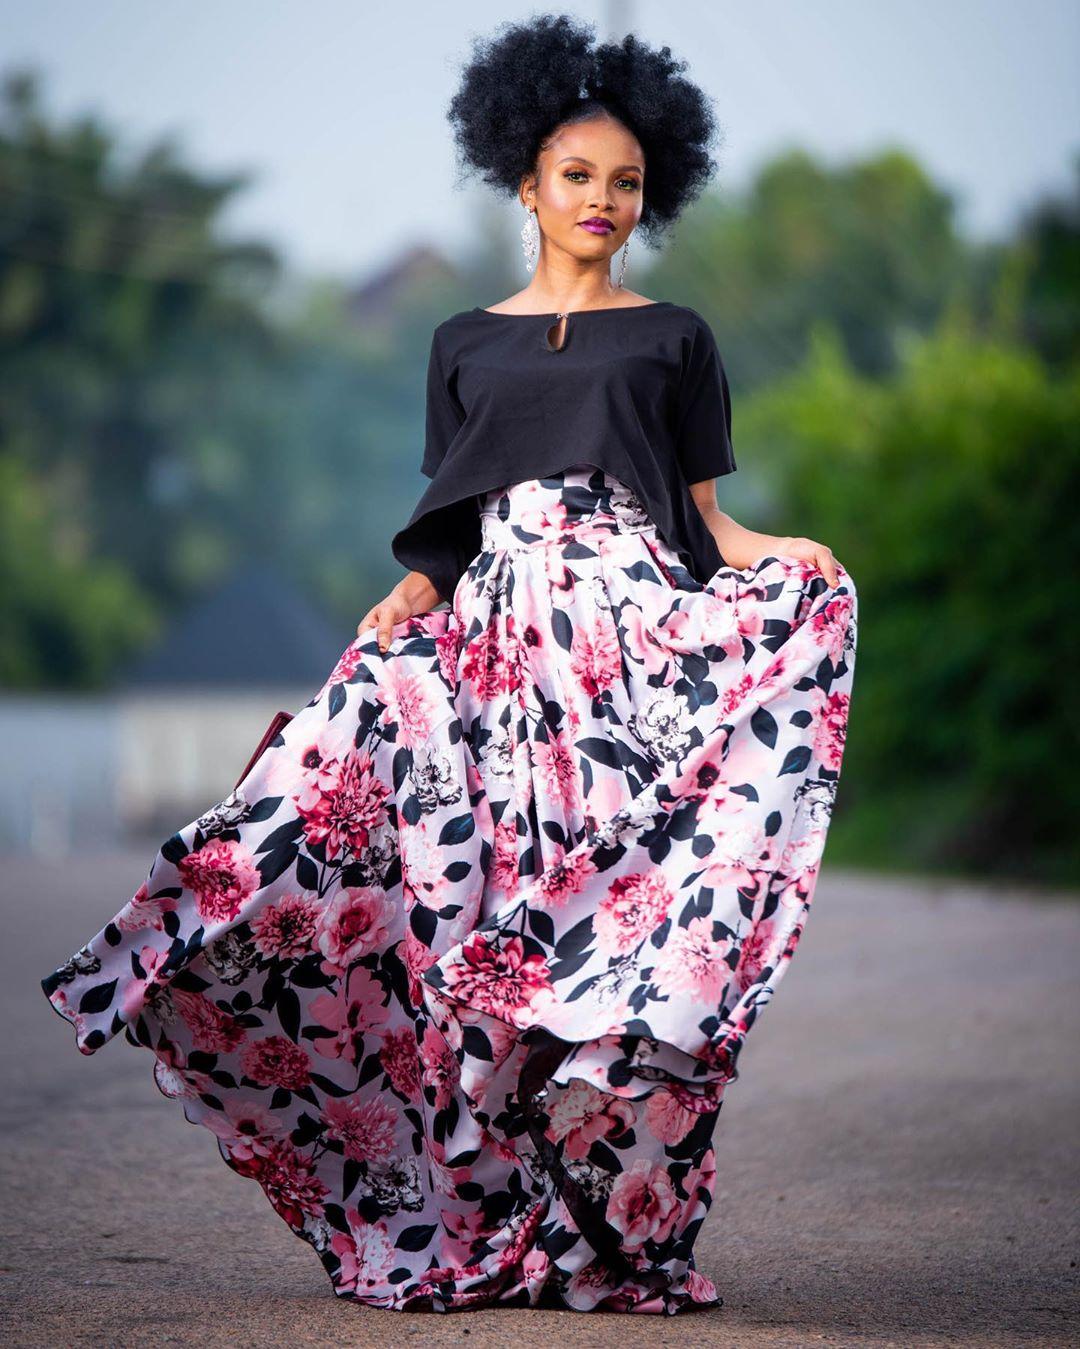 BEAUTIFUL NIGERIAN FASHION STYLES FOR WORK2020 4